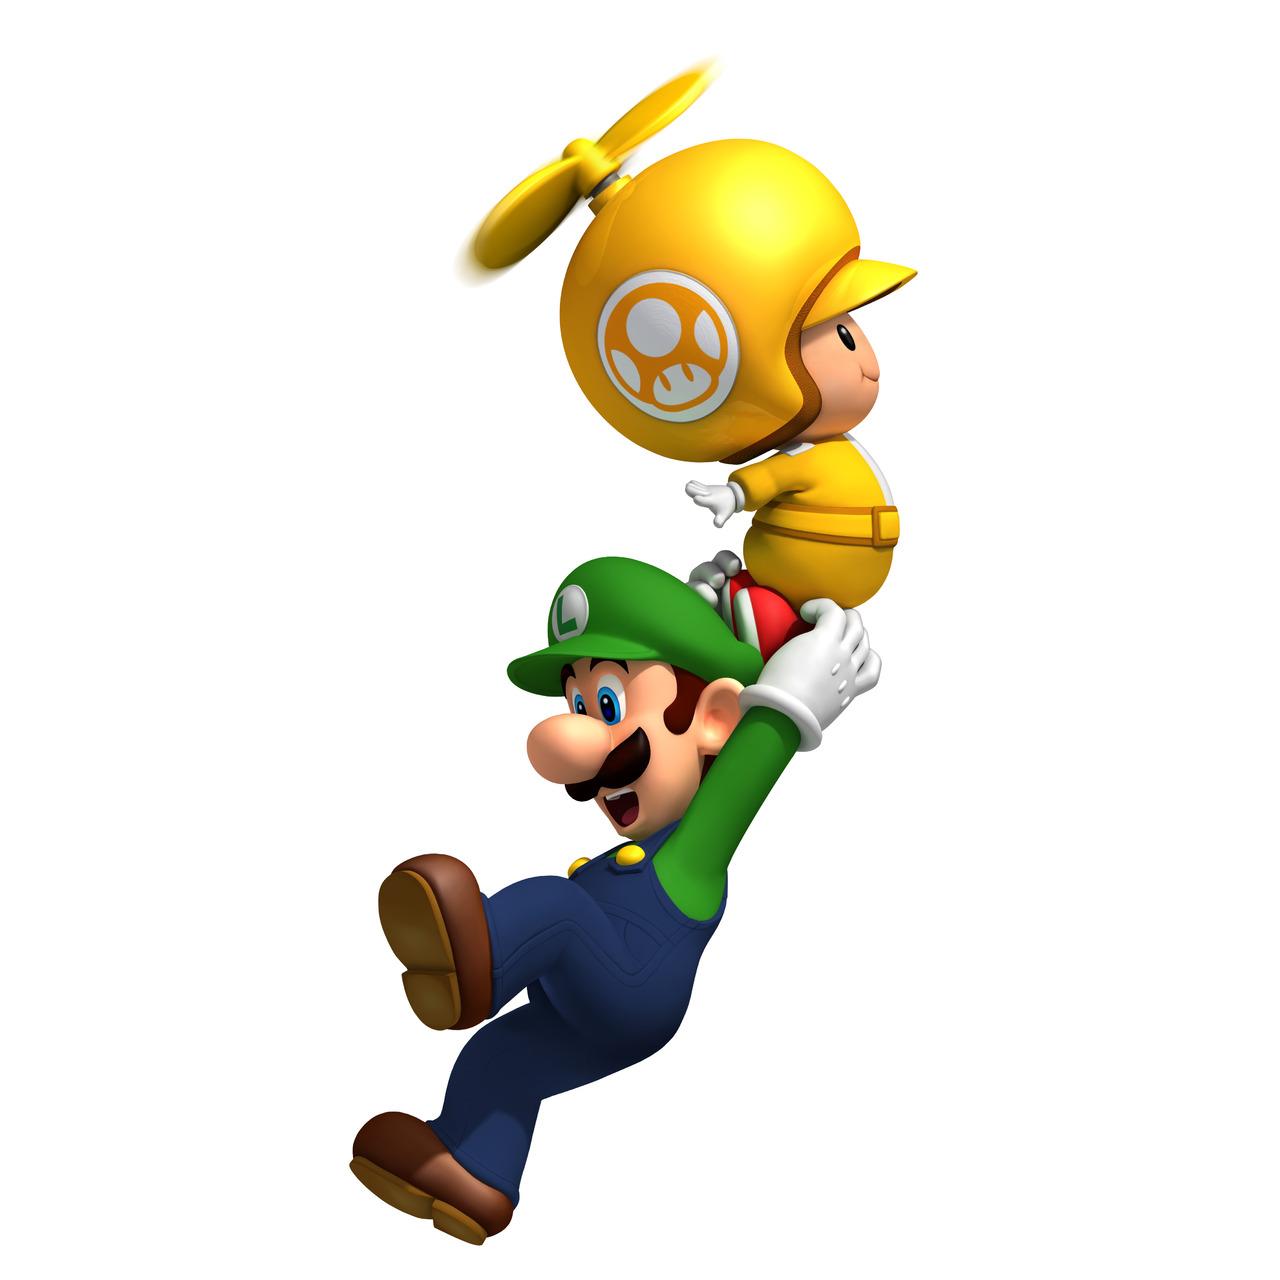 jeuxvideo.com New Super Mario Bros. Wii - Wii Image 16 sur 421